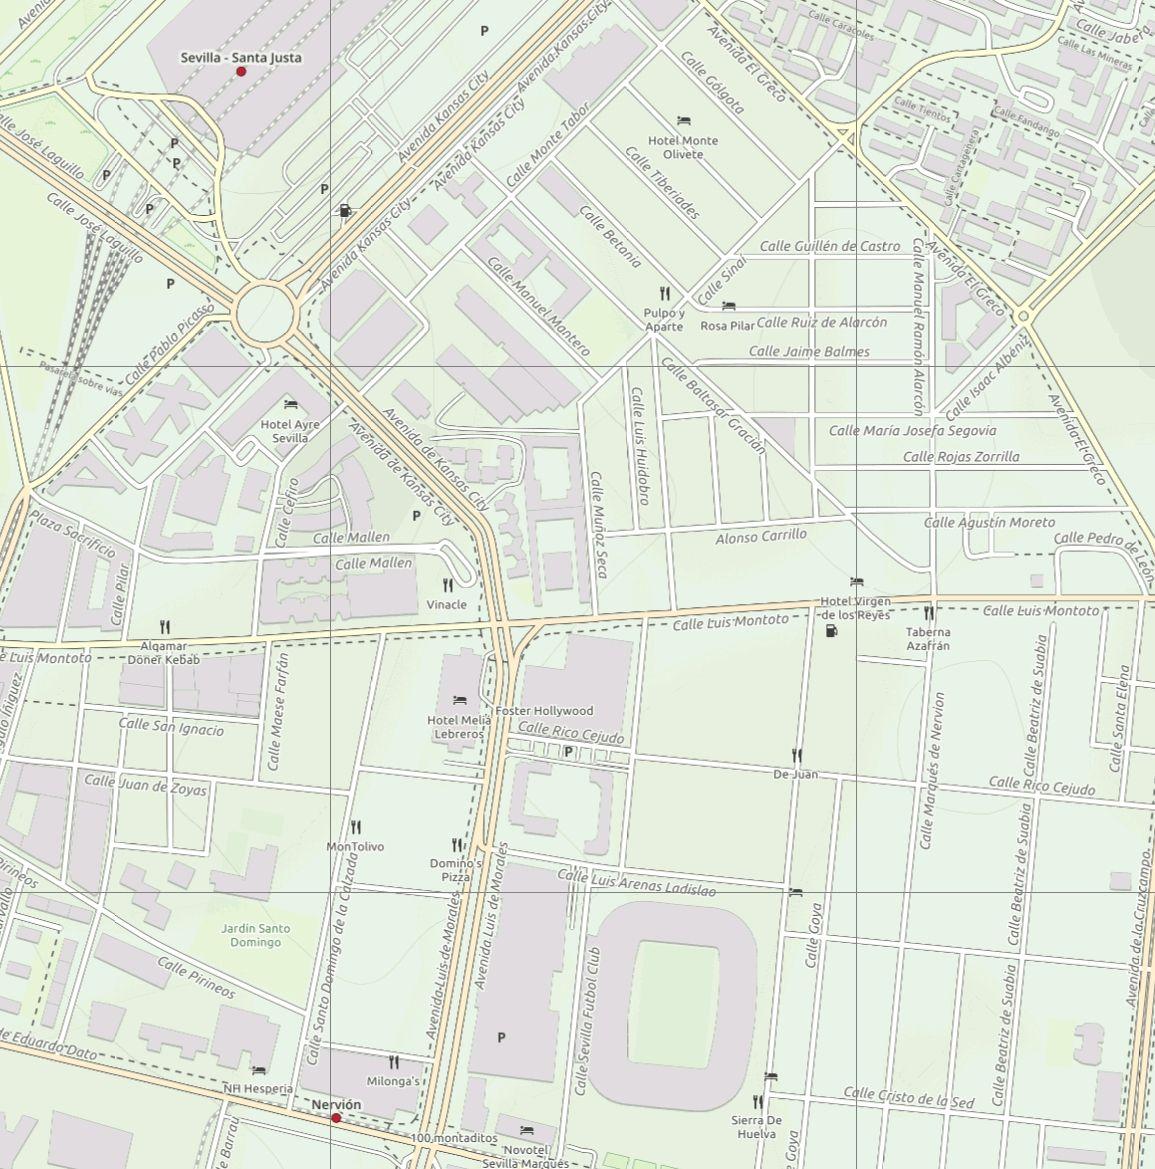 Sevilla Tourist Street Map - Paul Johnson - Offline Maps - Avenza Maps